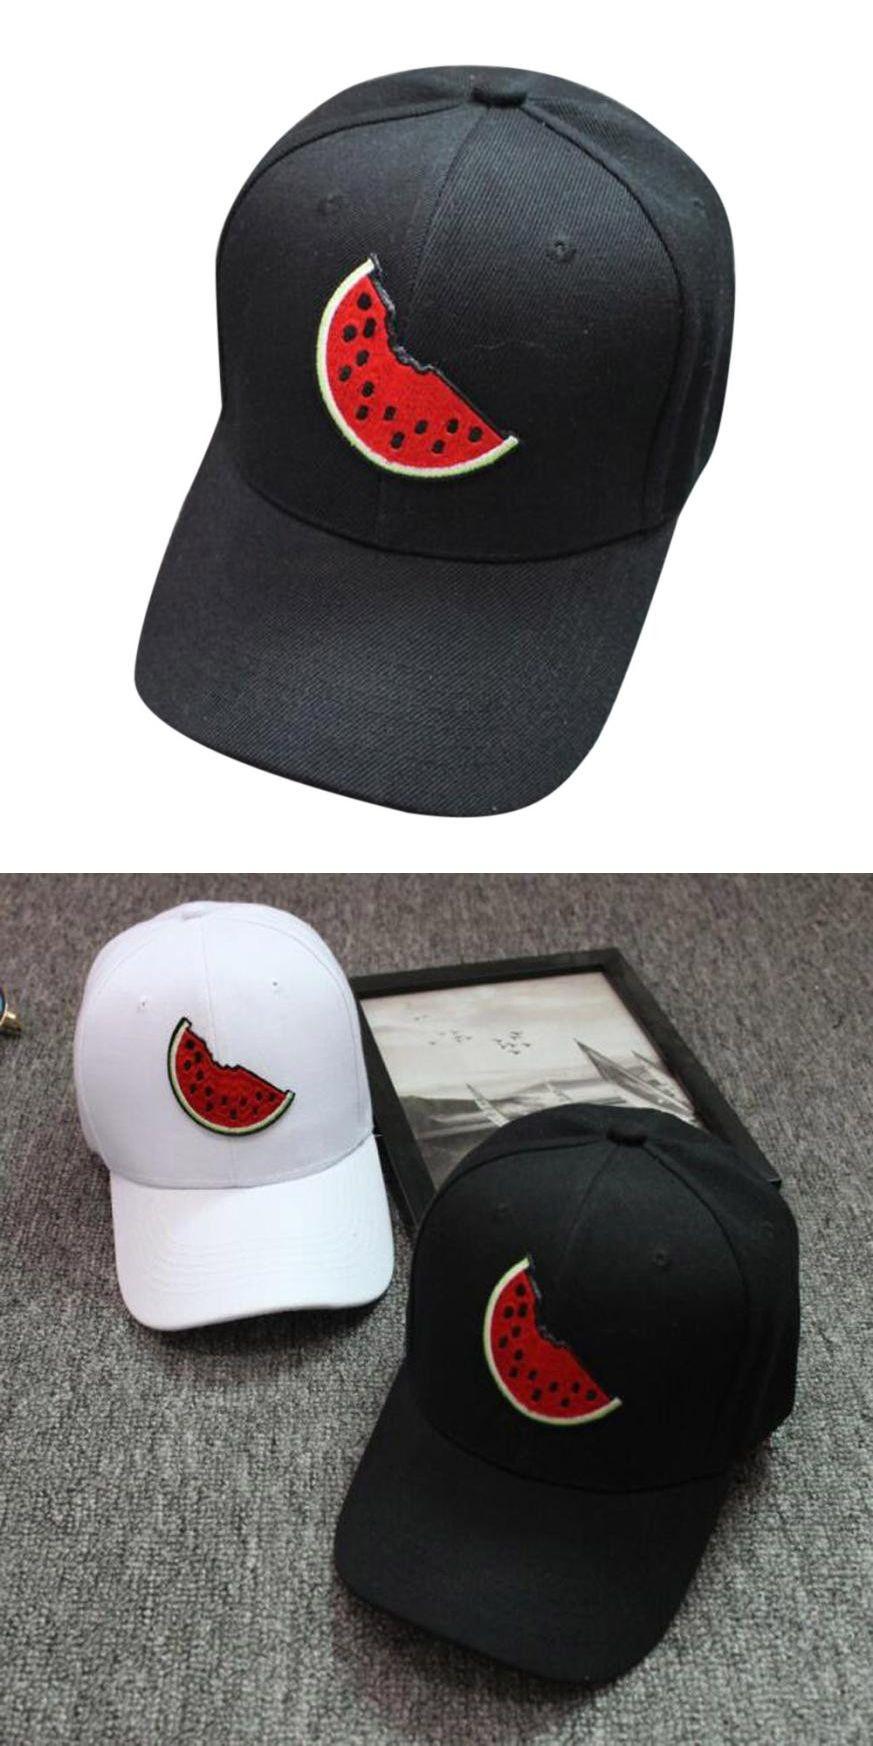 65bd614aaf1 2017 New Style Unisex Snapback Watermelon Hats Hip-Hop Adjustable Hat  Baseball Cap womens baseball